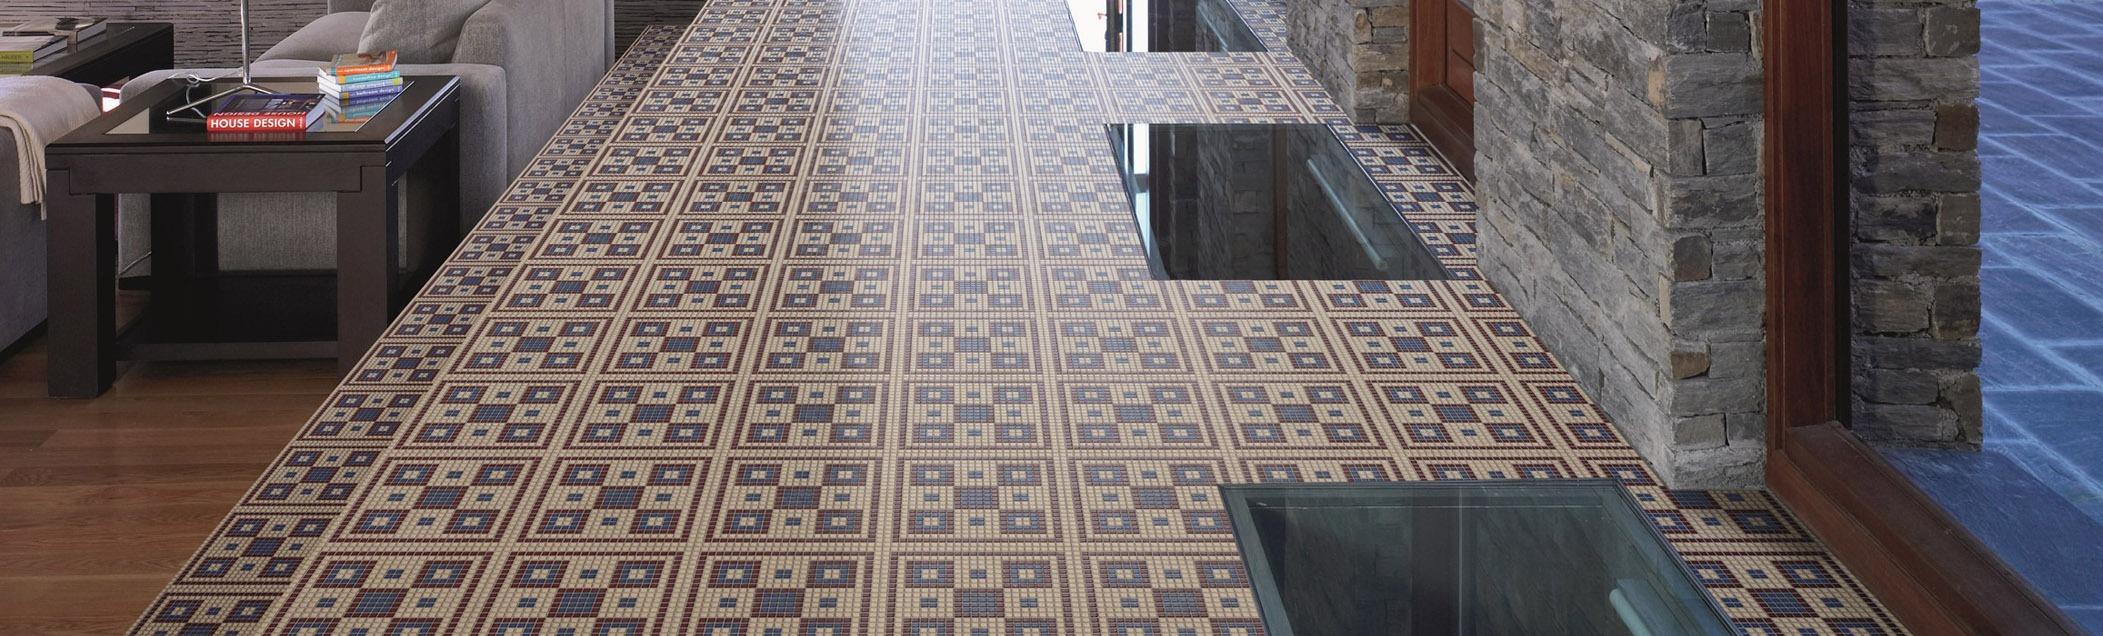 Living noce appiani mosaici per pavimenti living noce - Mosaico pavimento bagno ...